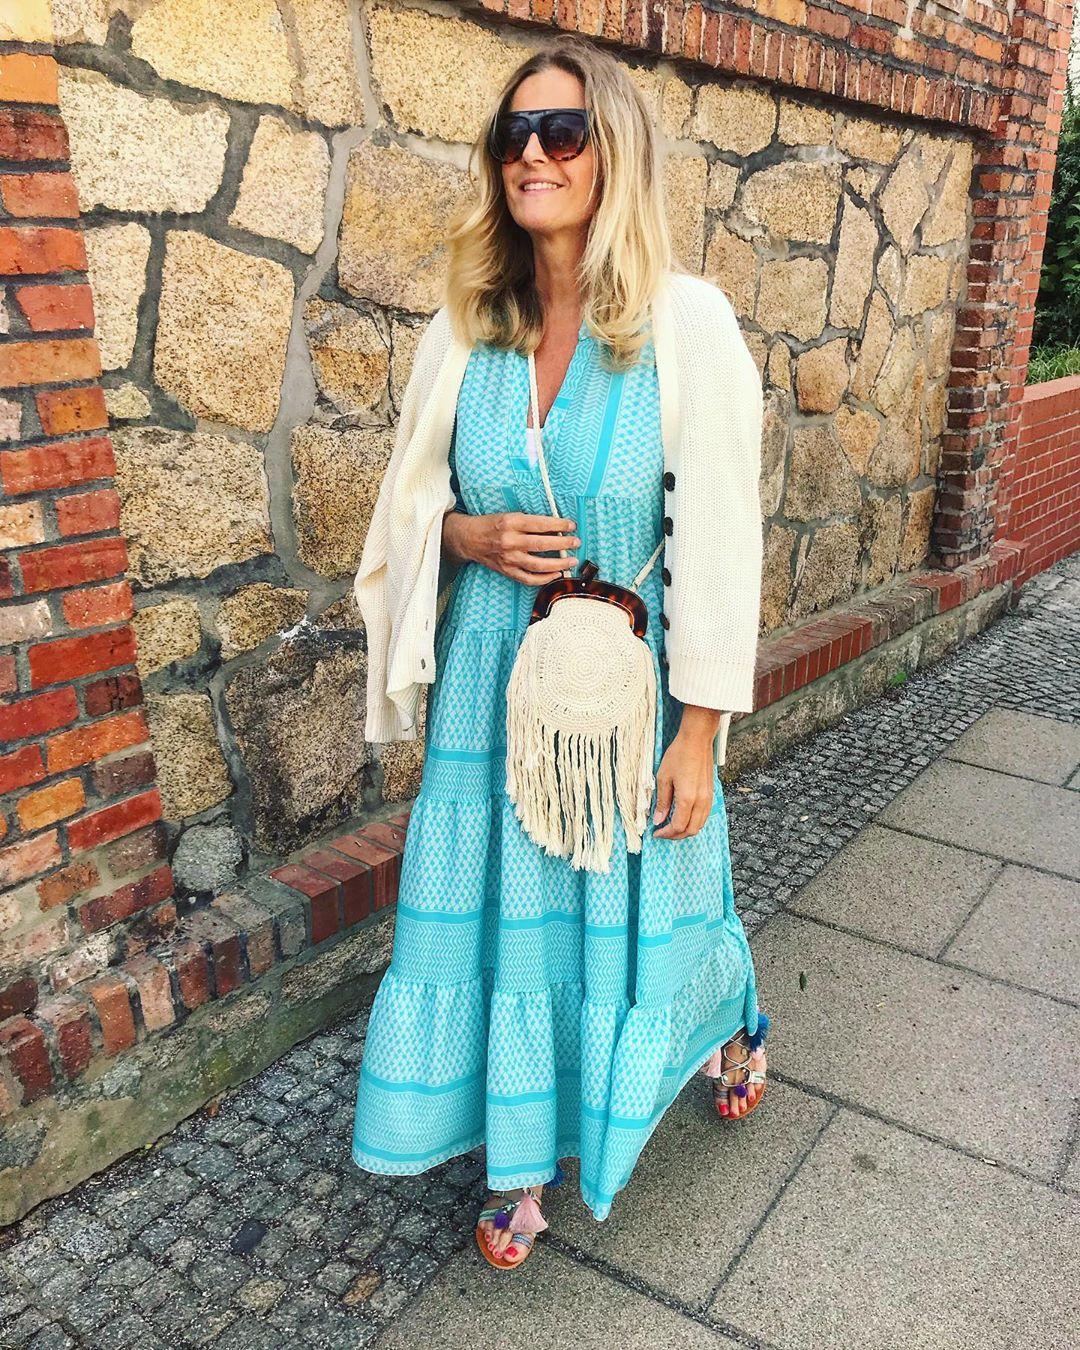 crossbody bag with tortoiseshell effect purse clasp de Zara sur misssim74